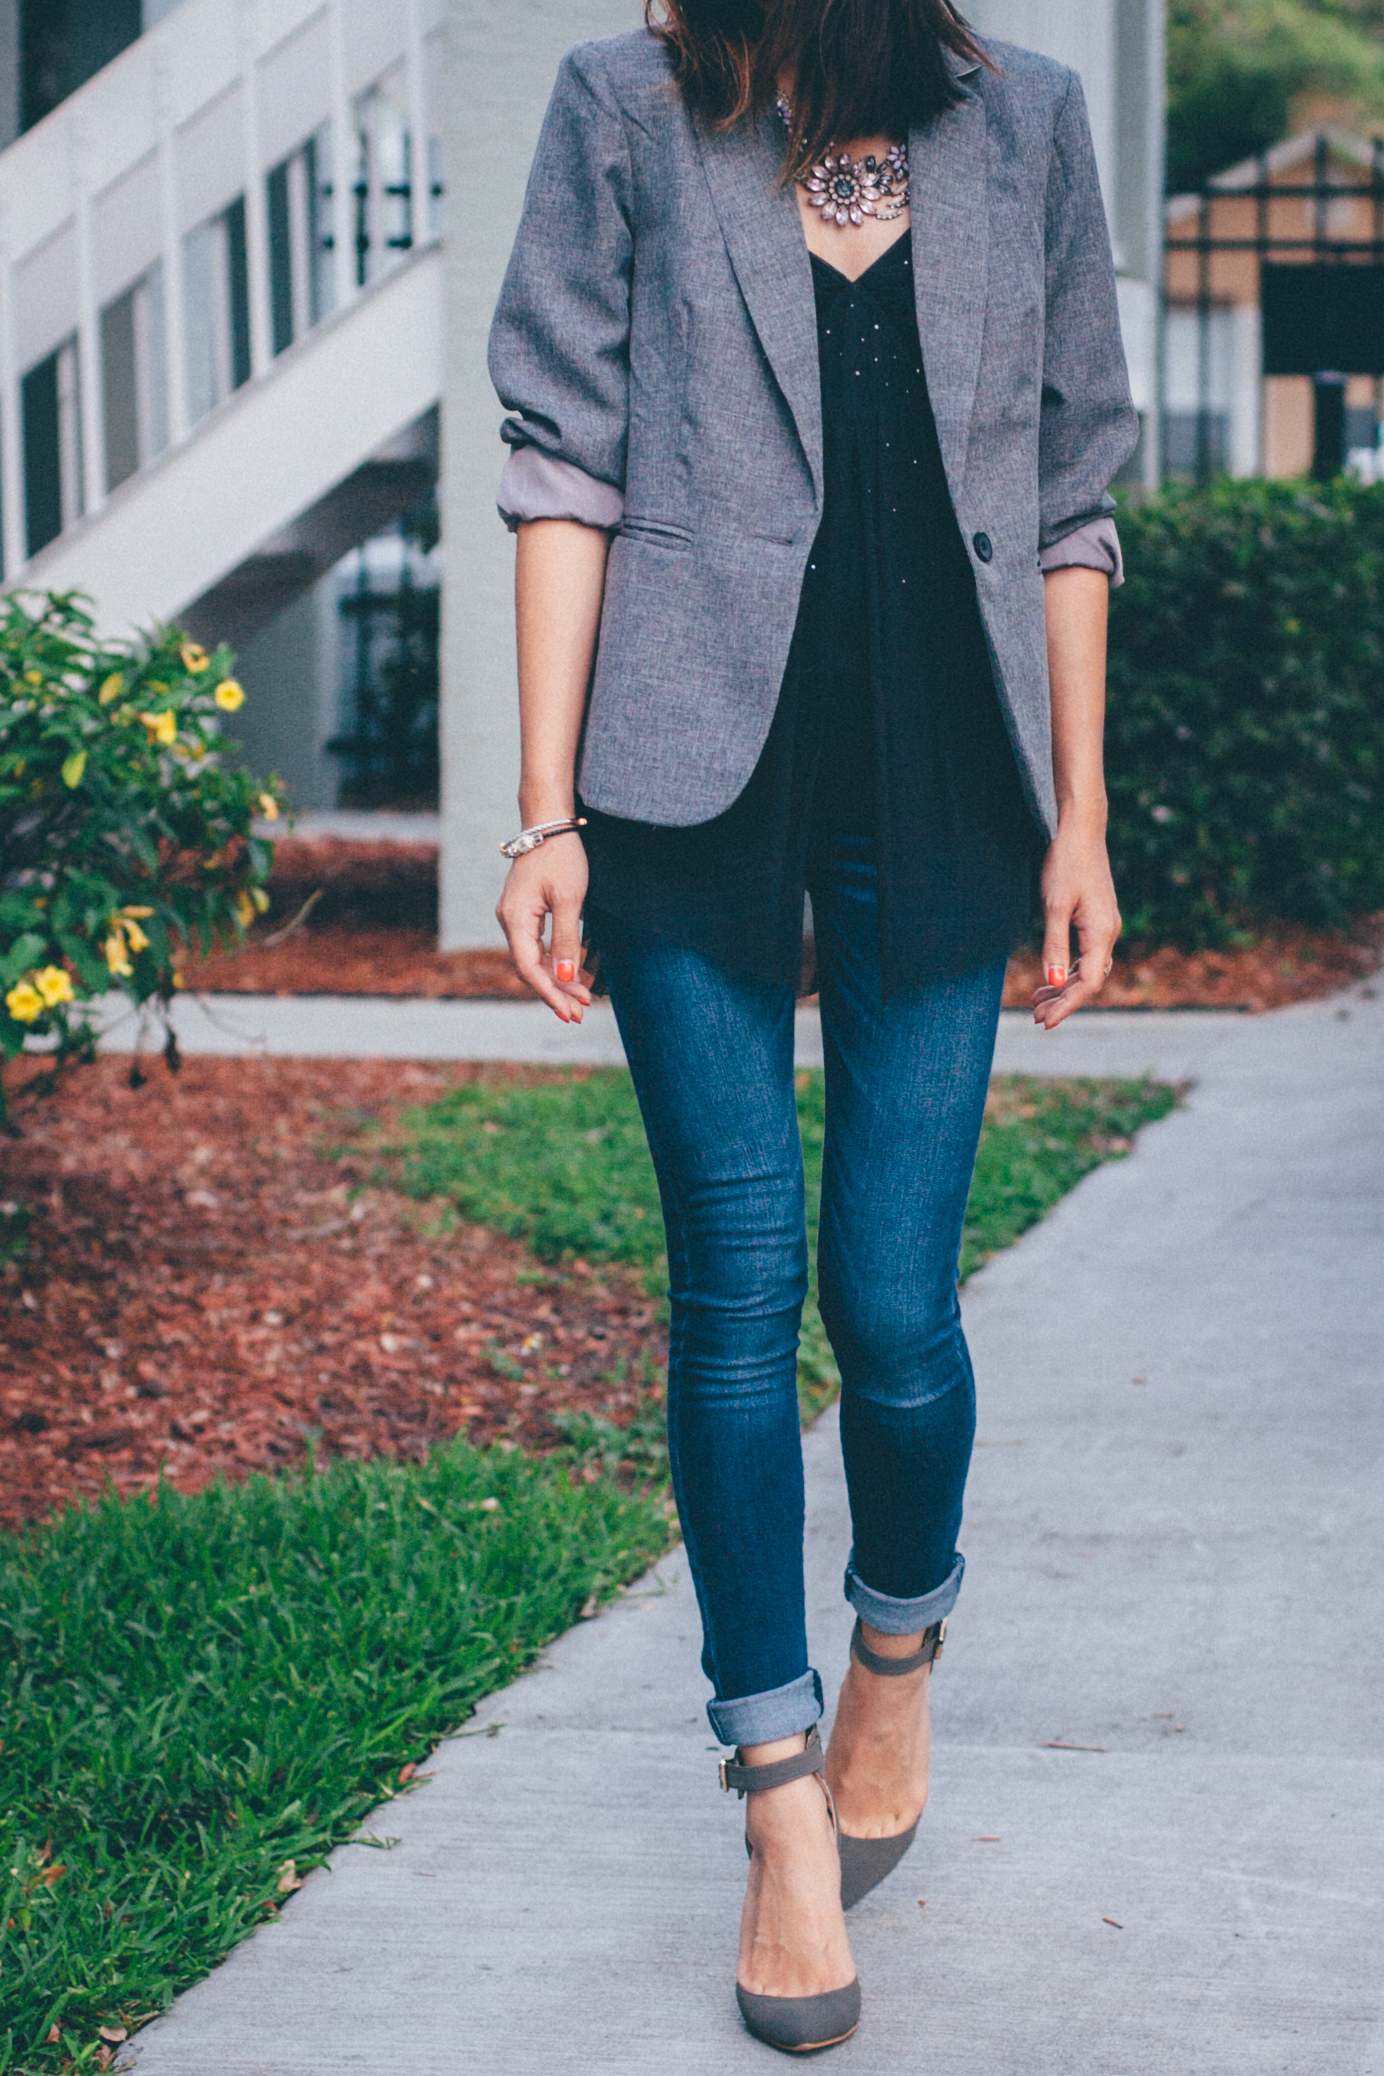 This Jenn Girl - Shein Gray Blazer 1